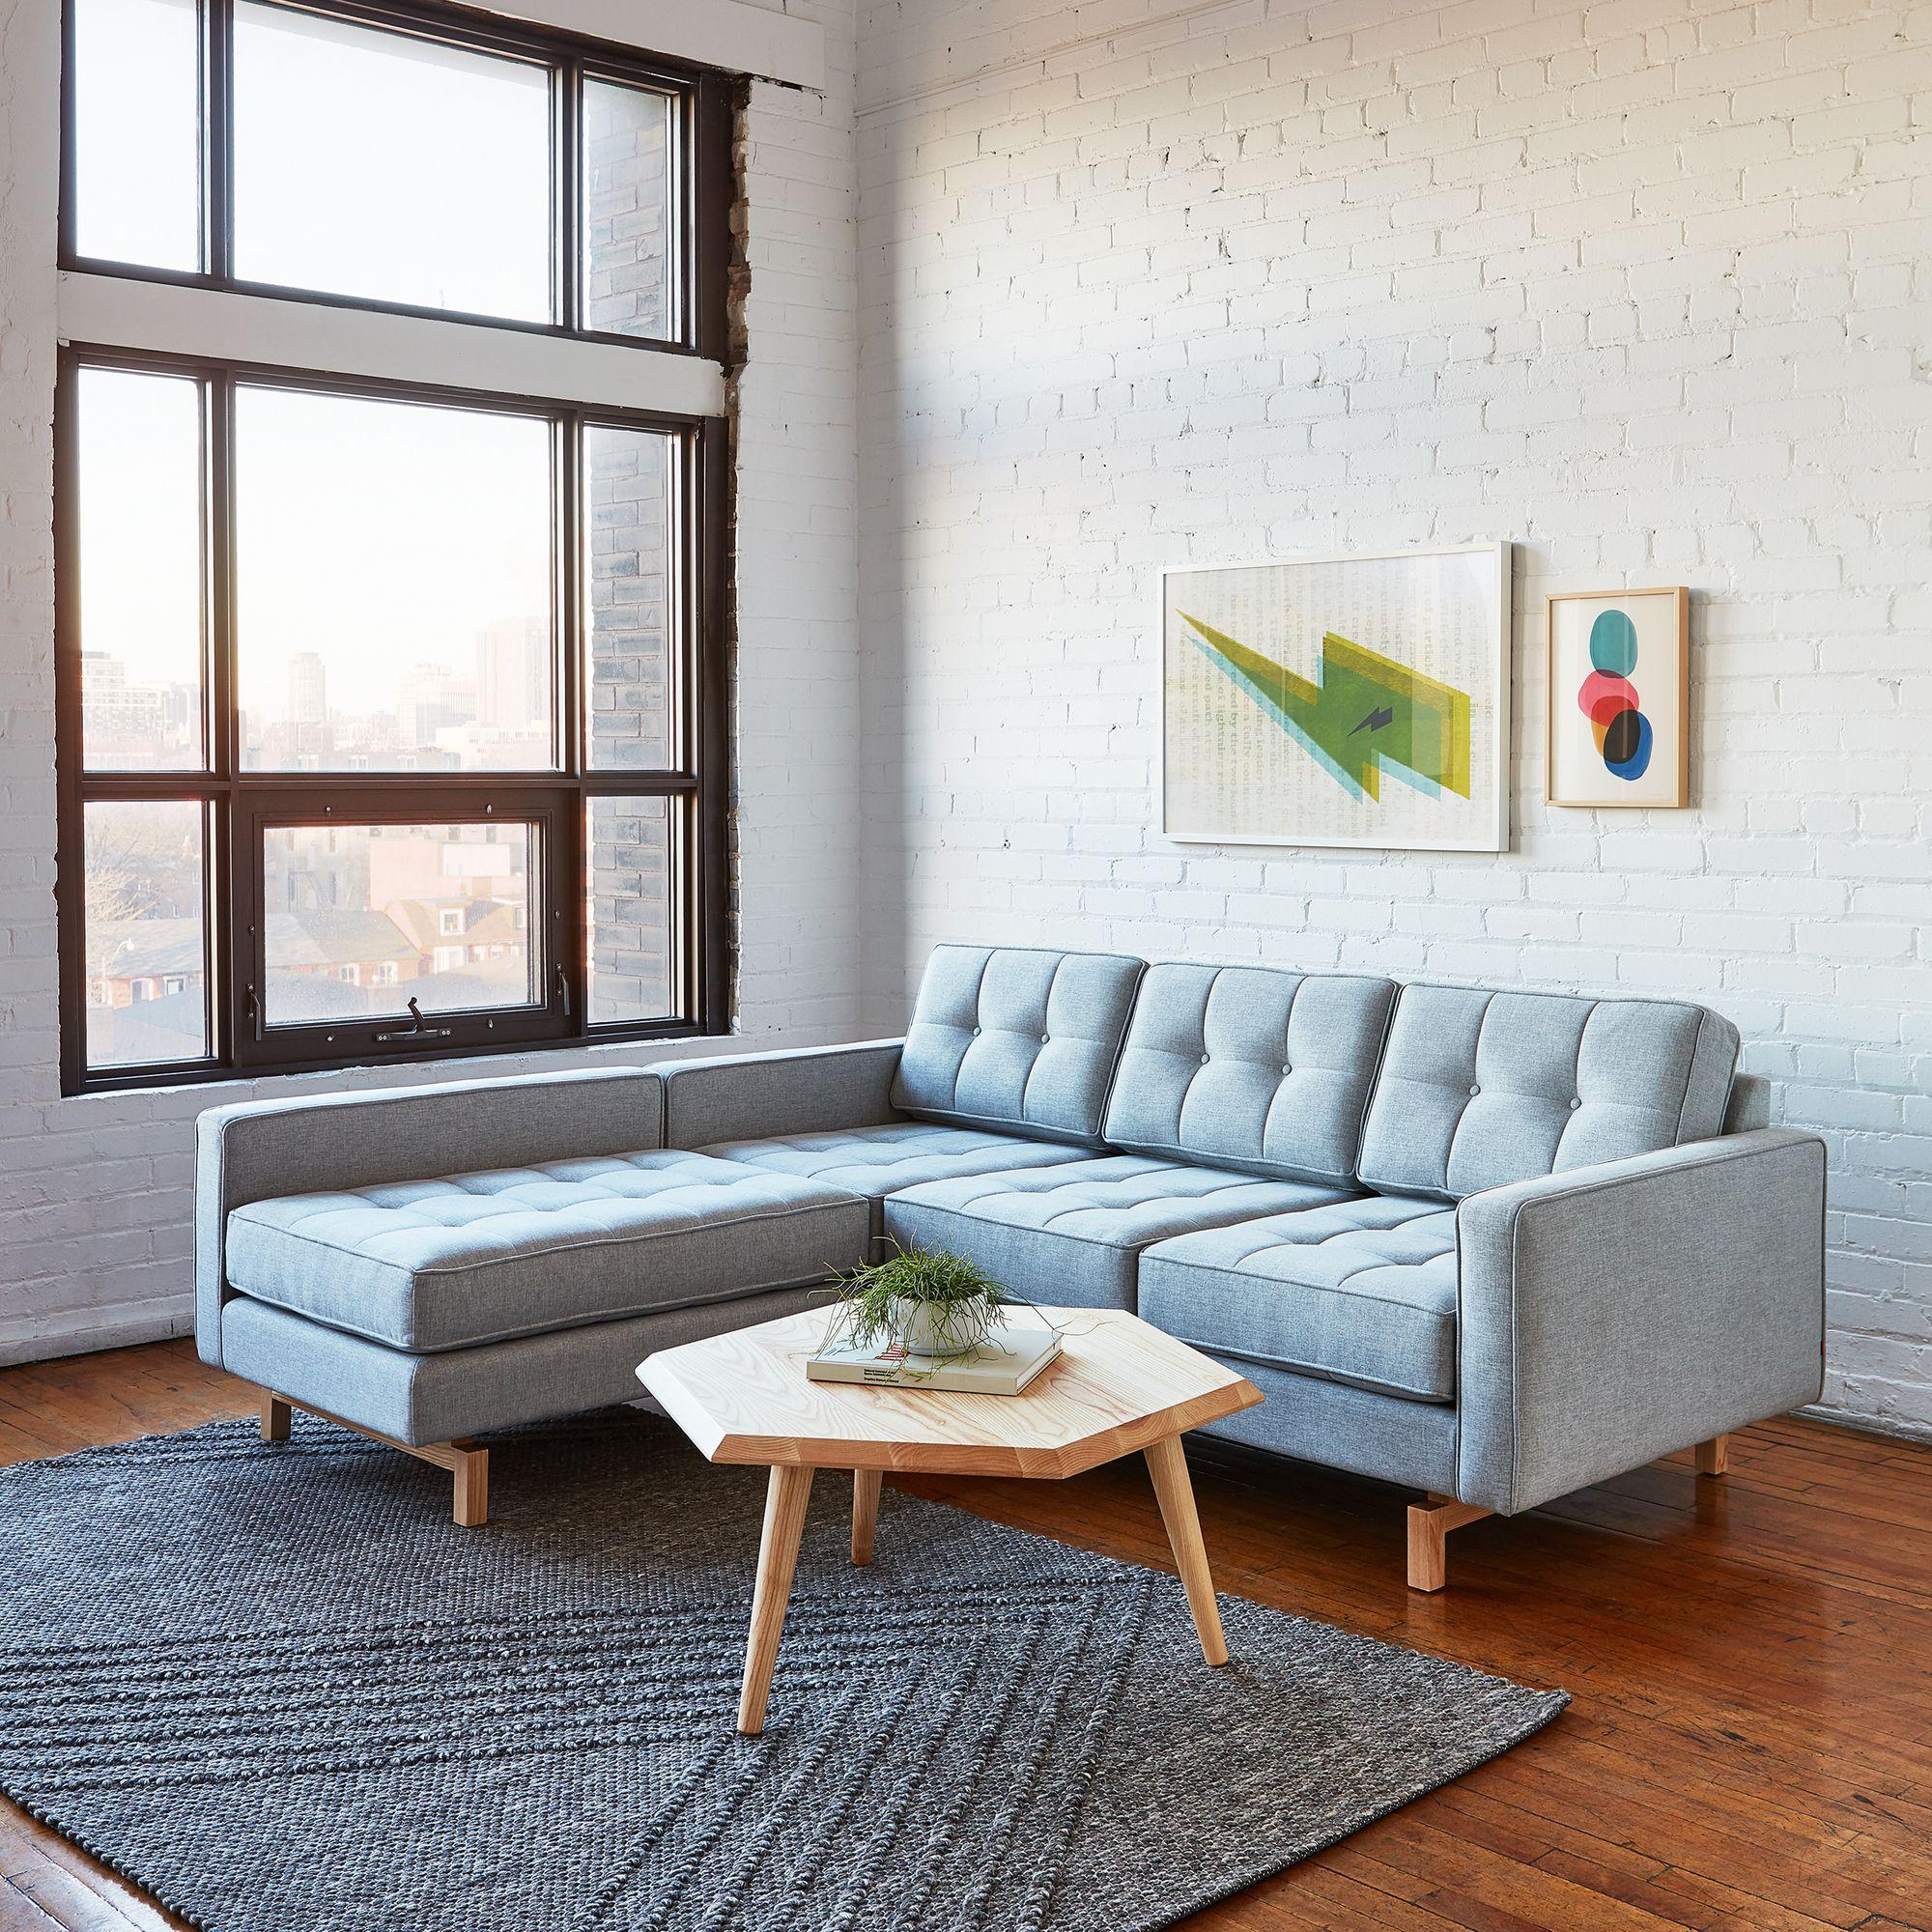 Jane 2 Bi Sectional In 2020 Furniture Gus Modern Furniture Gus Modern